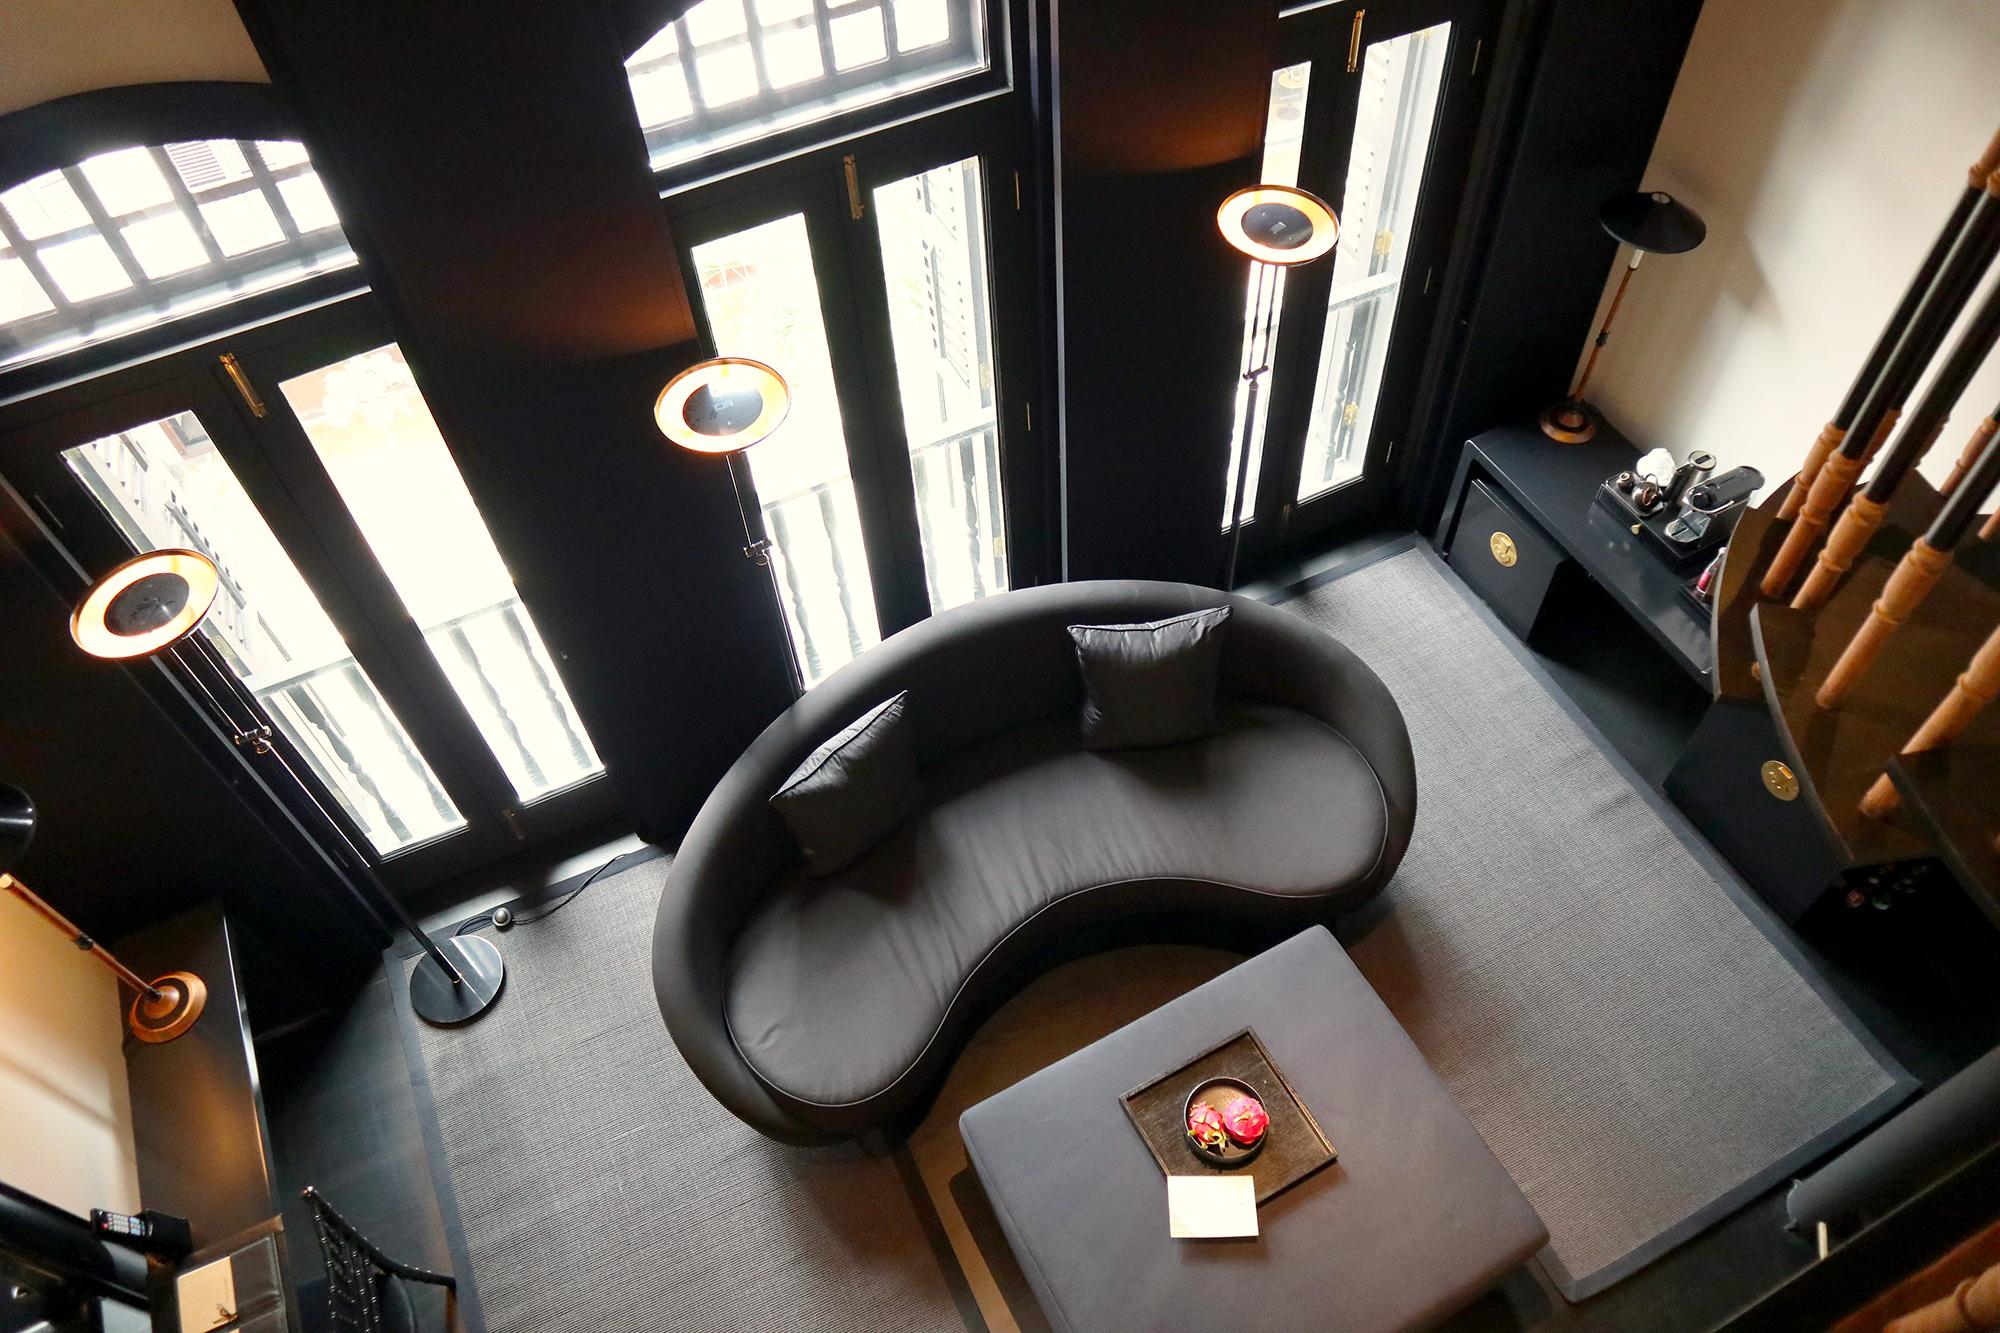 Duplex - Living Above